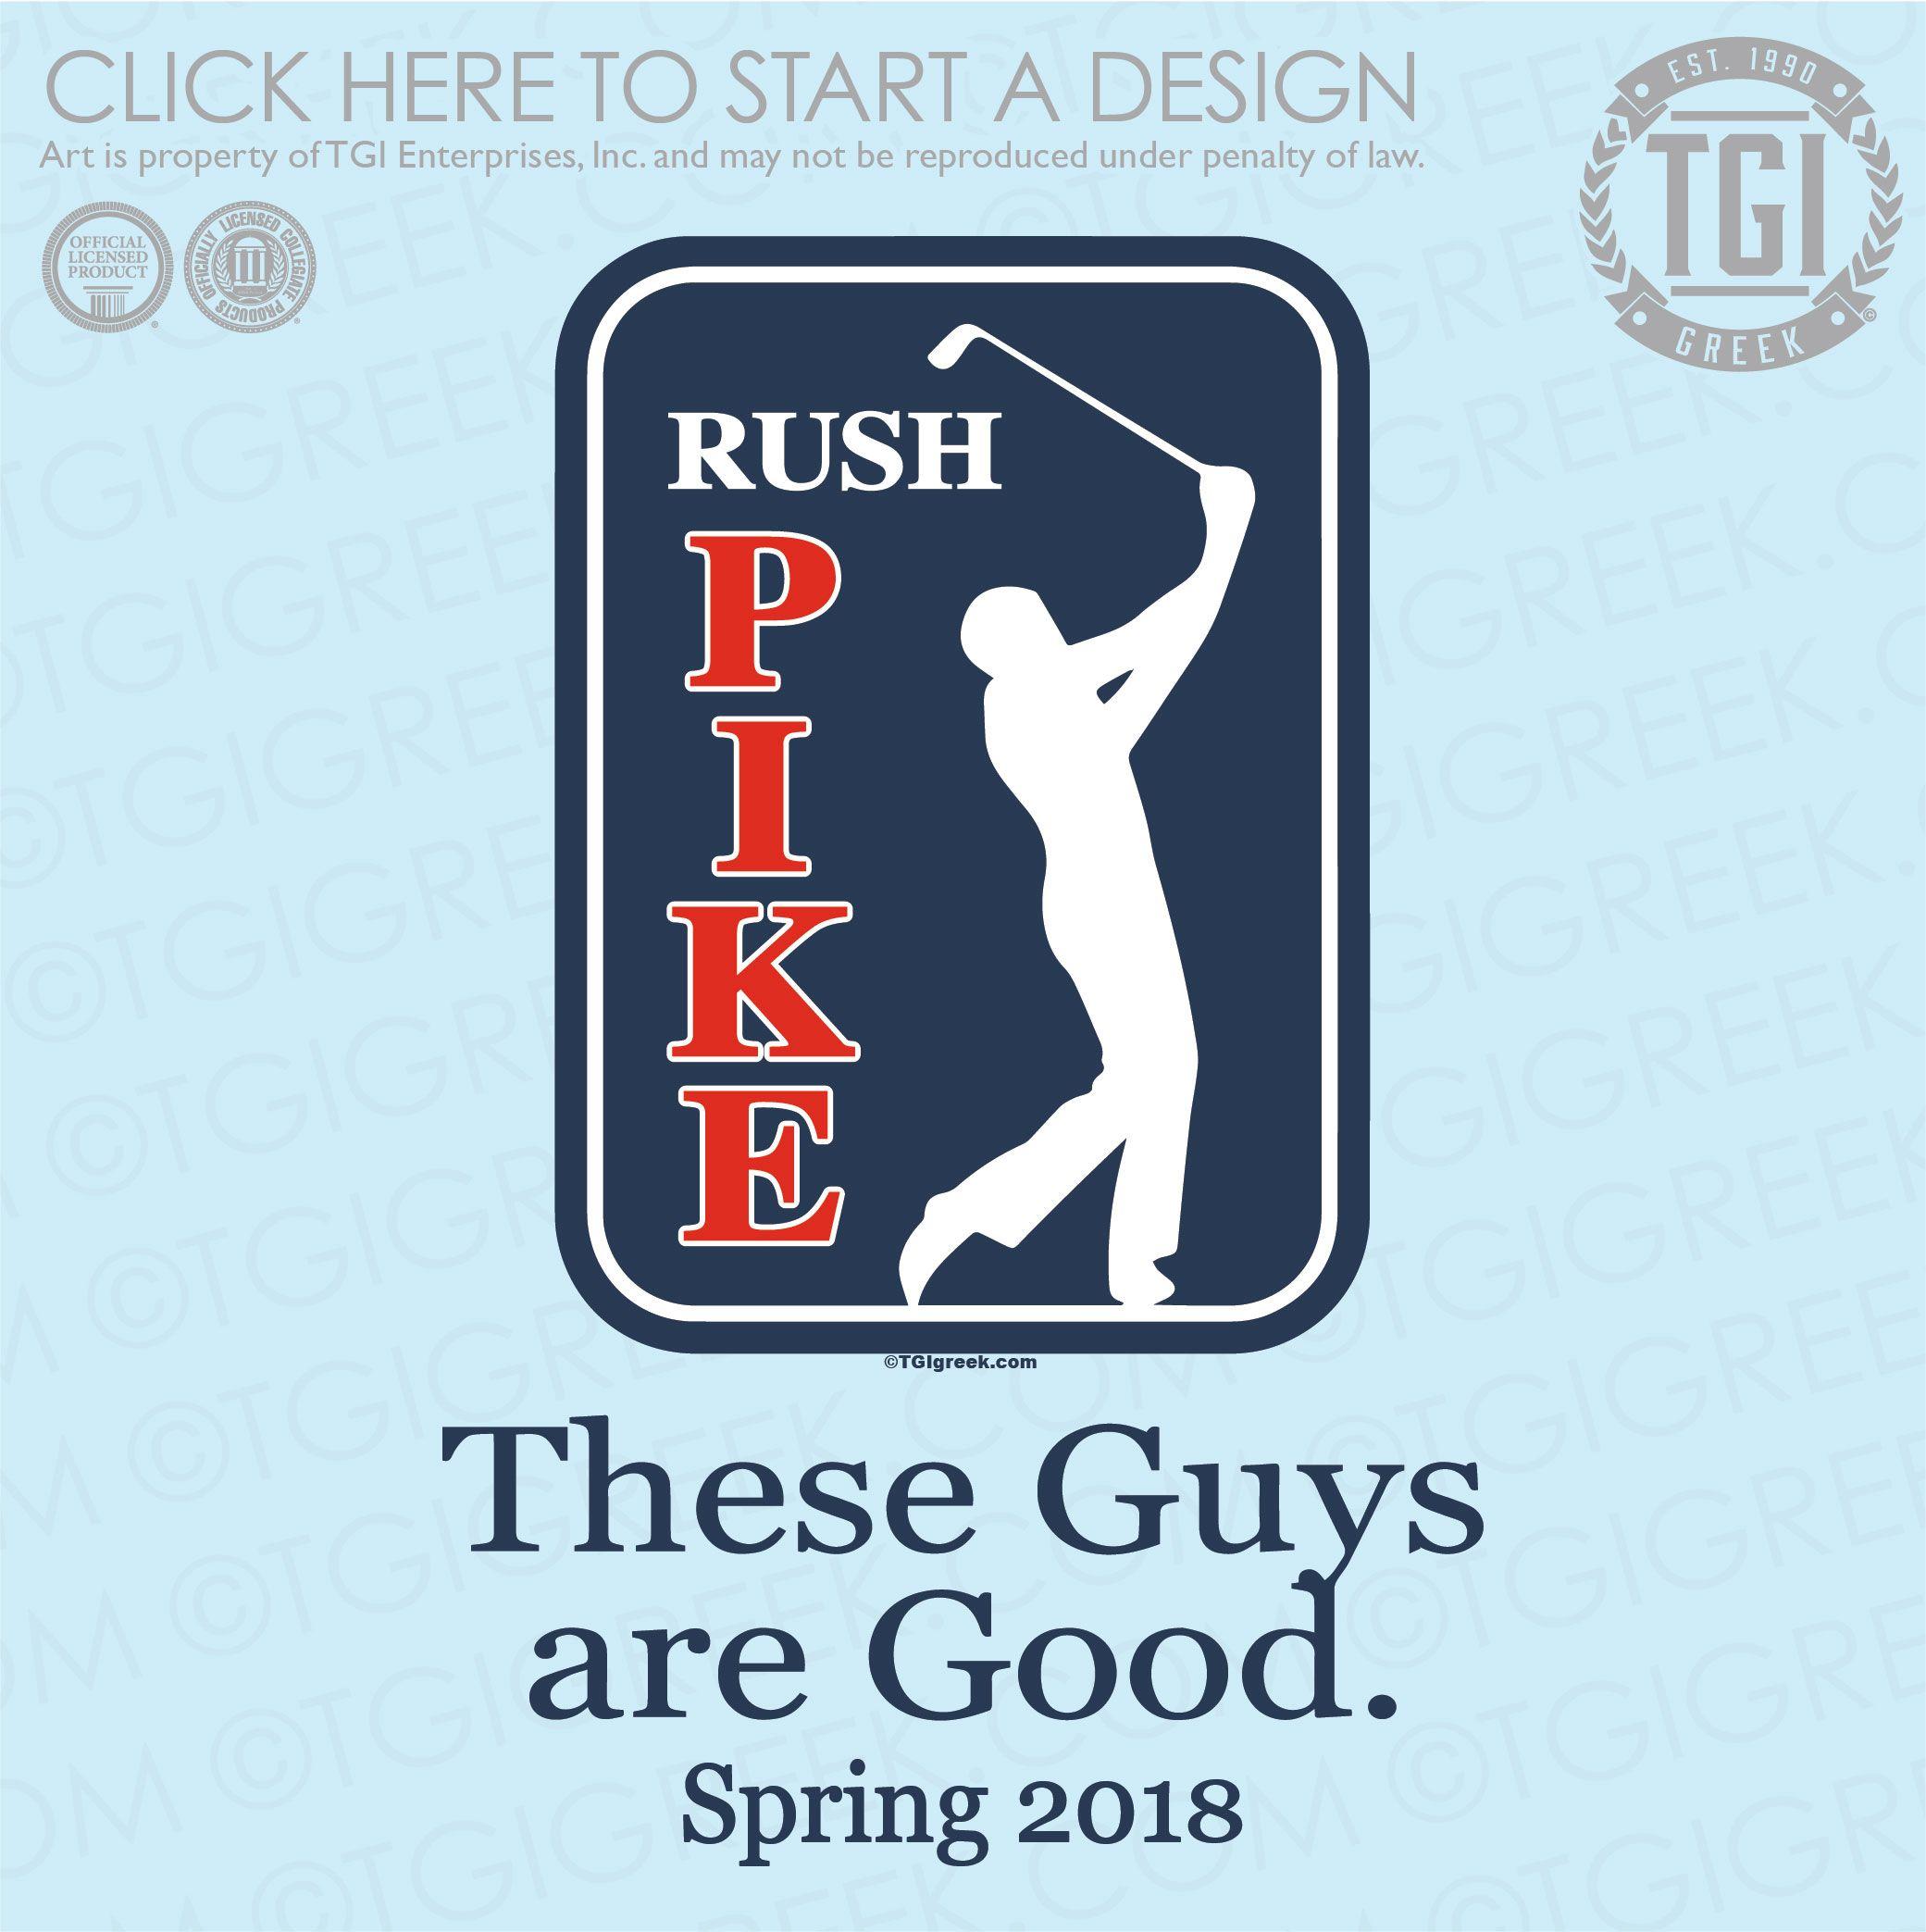 Pi kappa alpha ka pike rush fraternity rush rush shirt pi kappa alpha ka pike rush fraternity rush rush shirt biocorpaavc Images